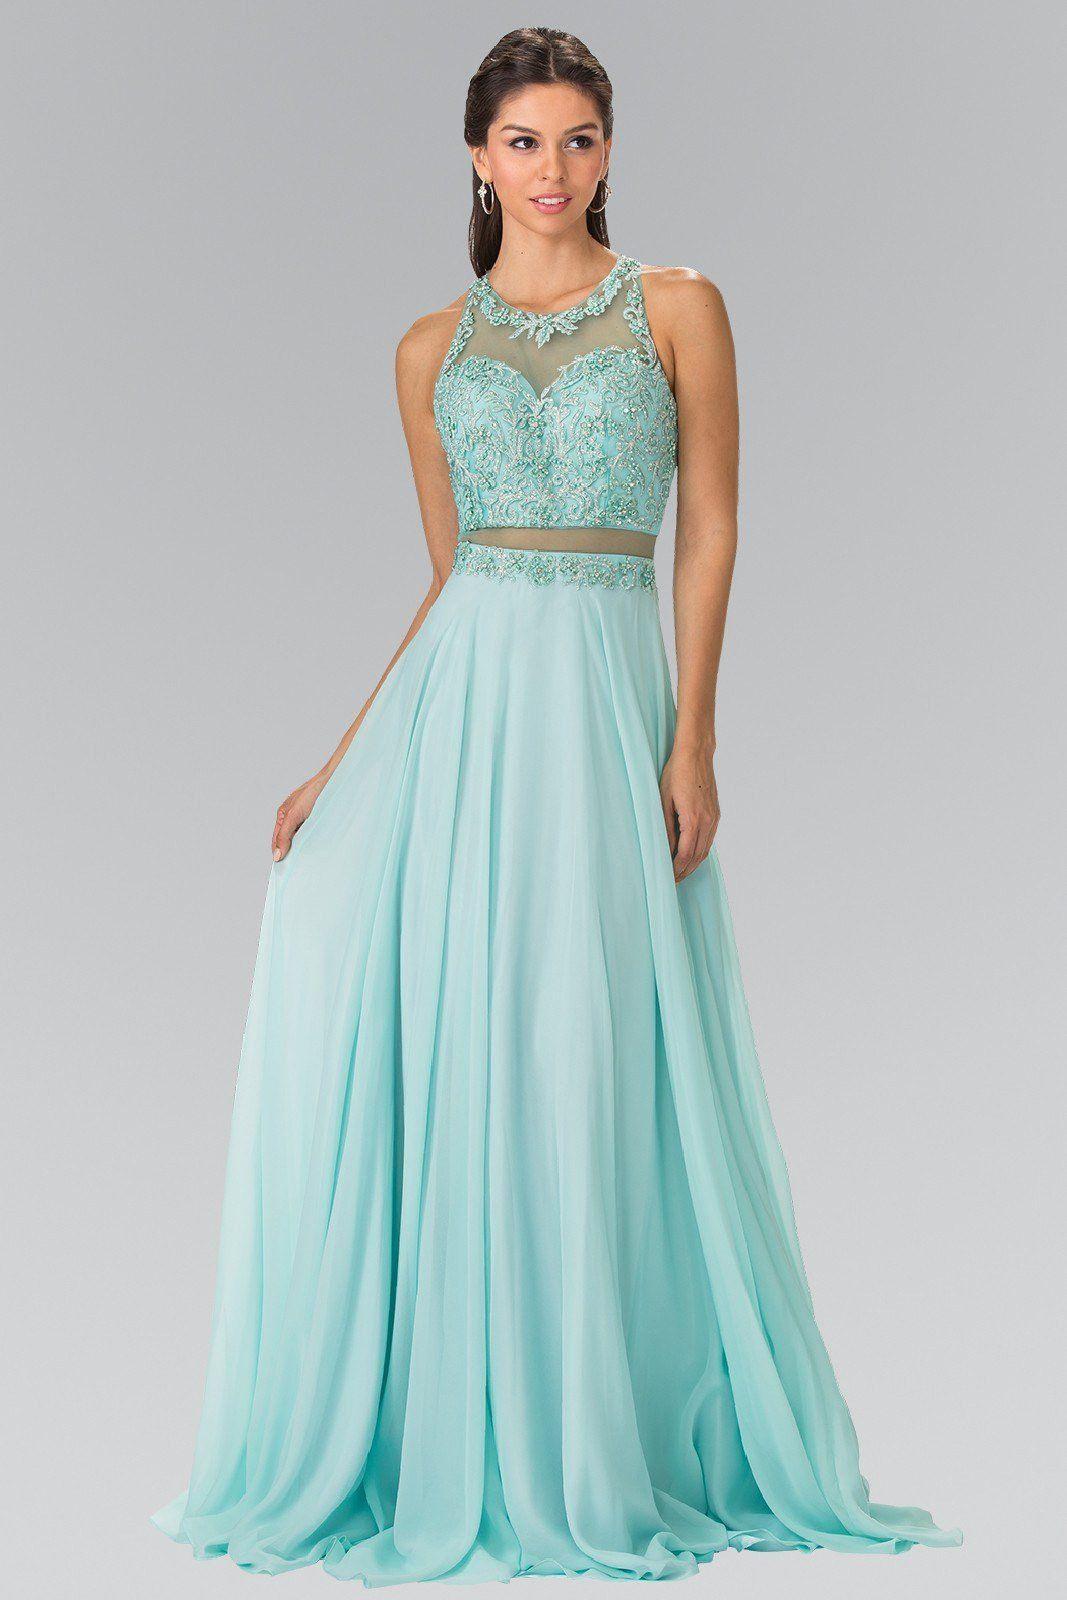 Fancy Prom Dresses Fort Worth Ensign - All Wedding Dresses ...